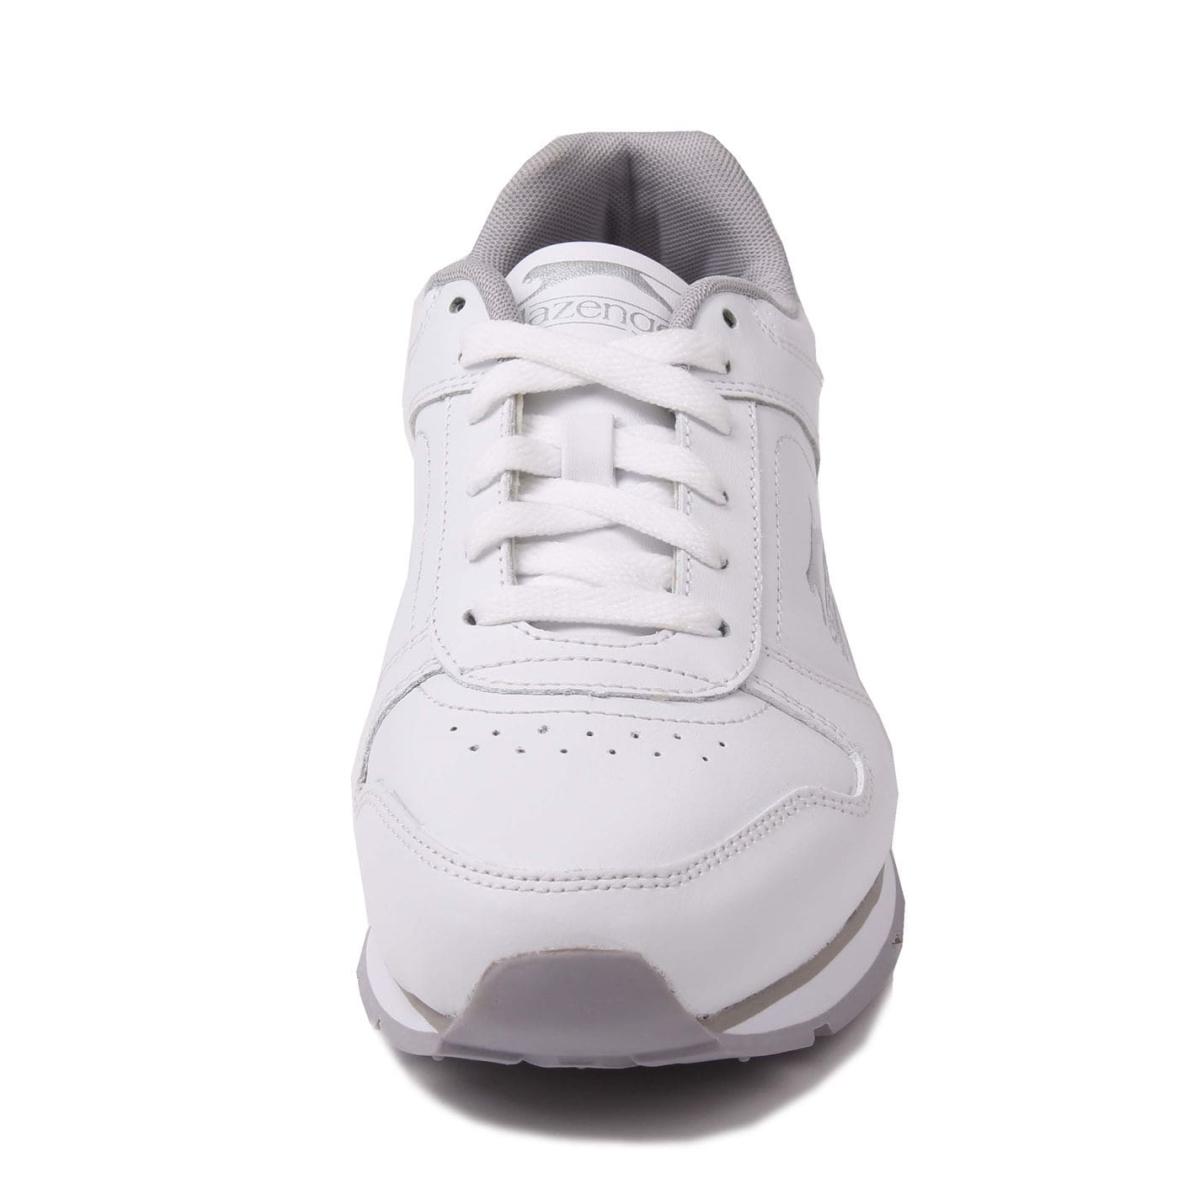 Slazenger-Classic-Turnschuhe-Laufschuhe-Damen-Sportschuhe-Sneaker-1265 Indexbild 28